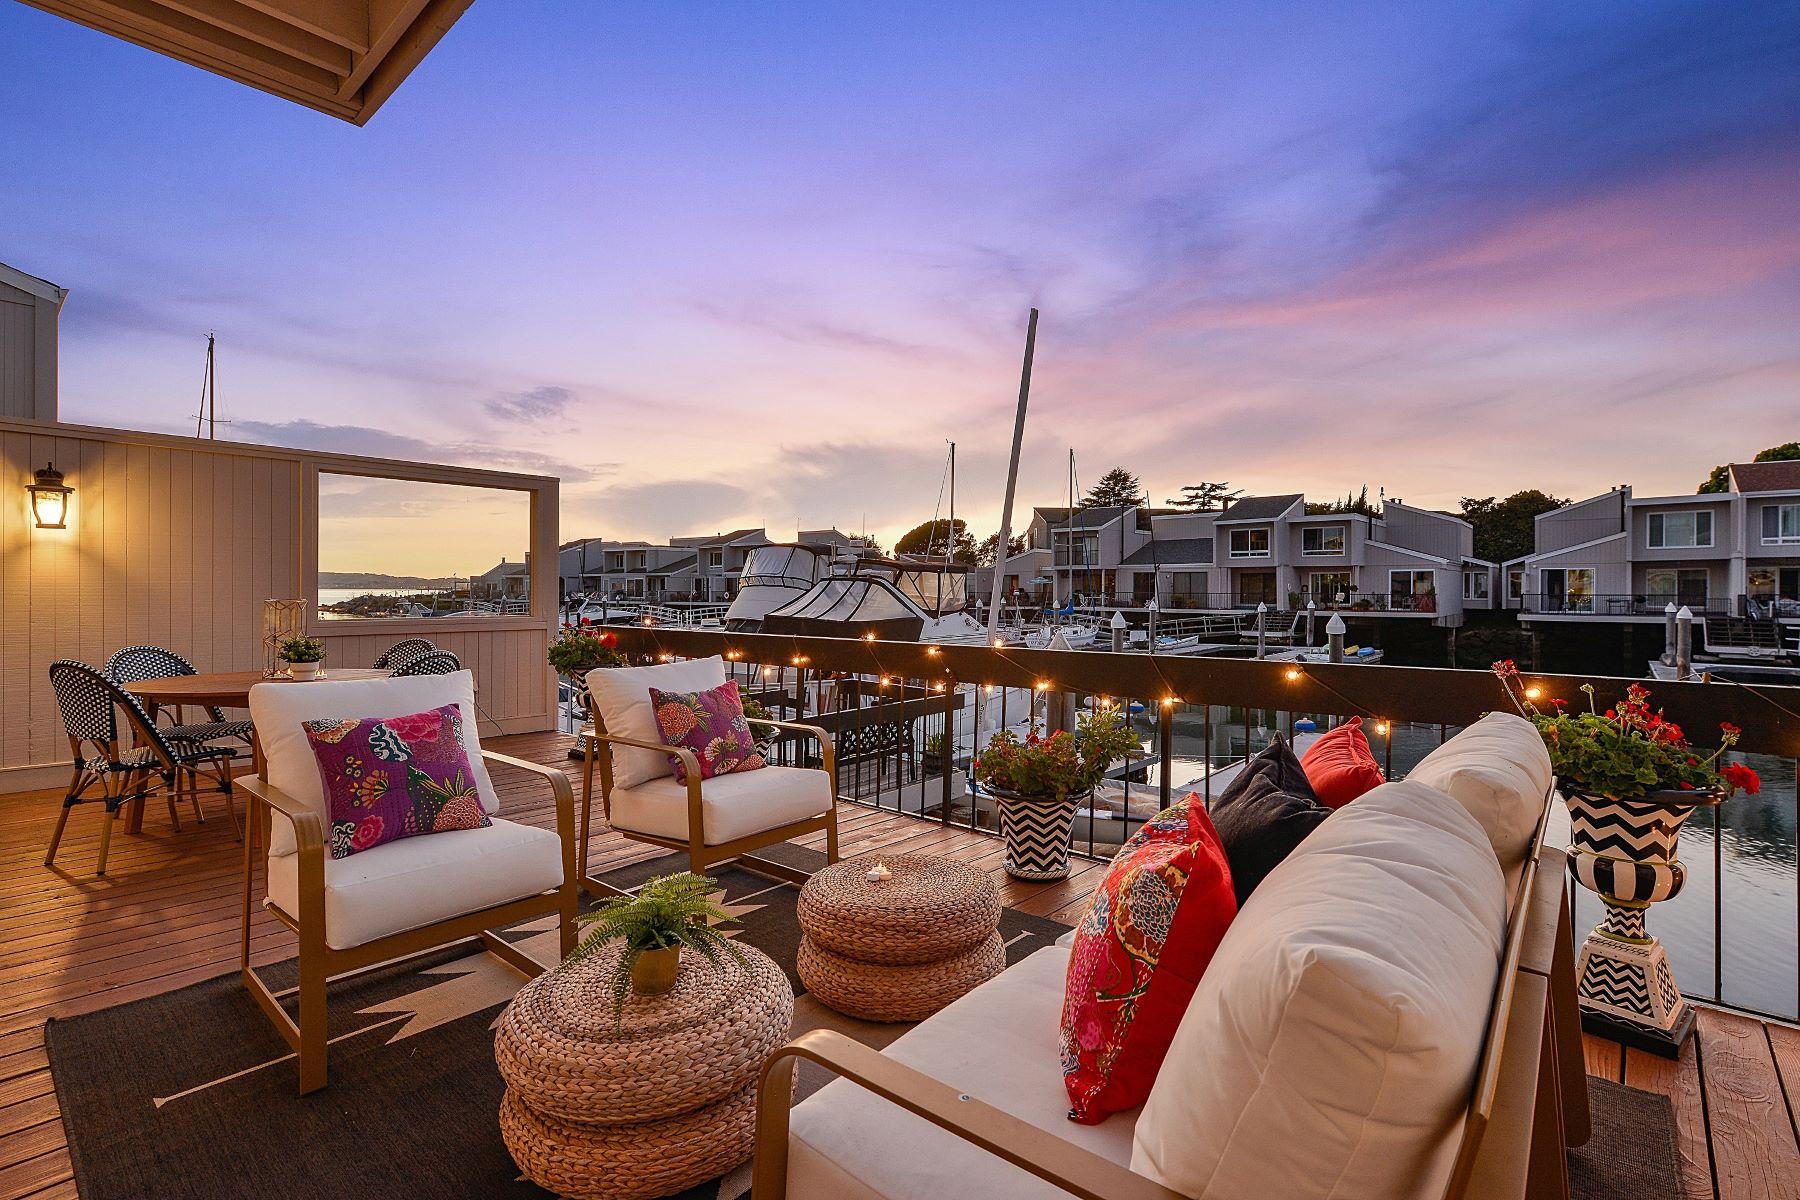 Single Family Homes for Sale at Elegant Alameda Home With Boat Slip 1229 Ballena Boulevard Alameda, California 94501 United States